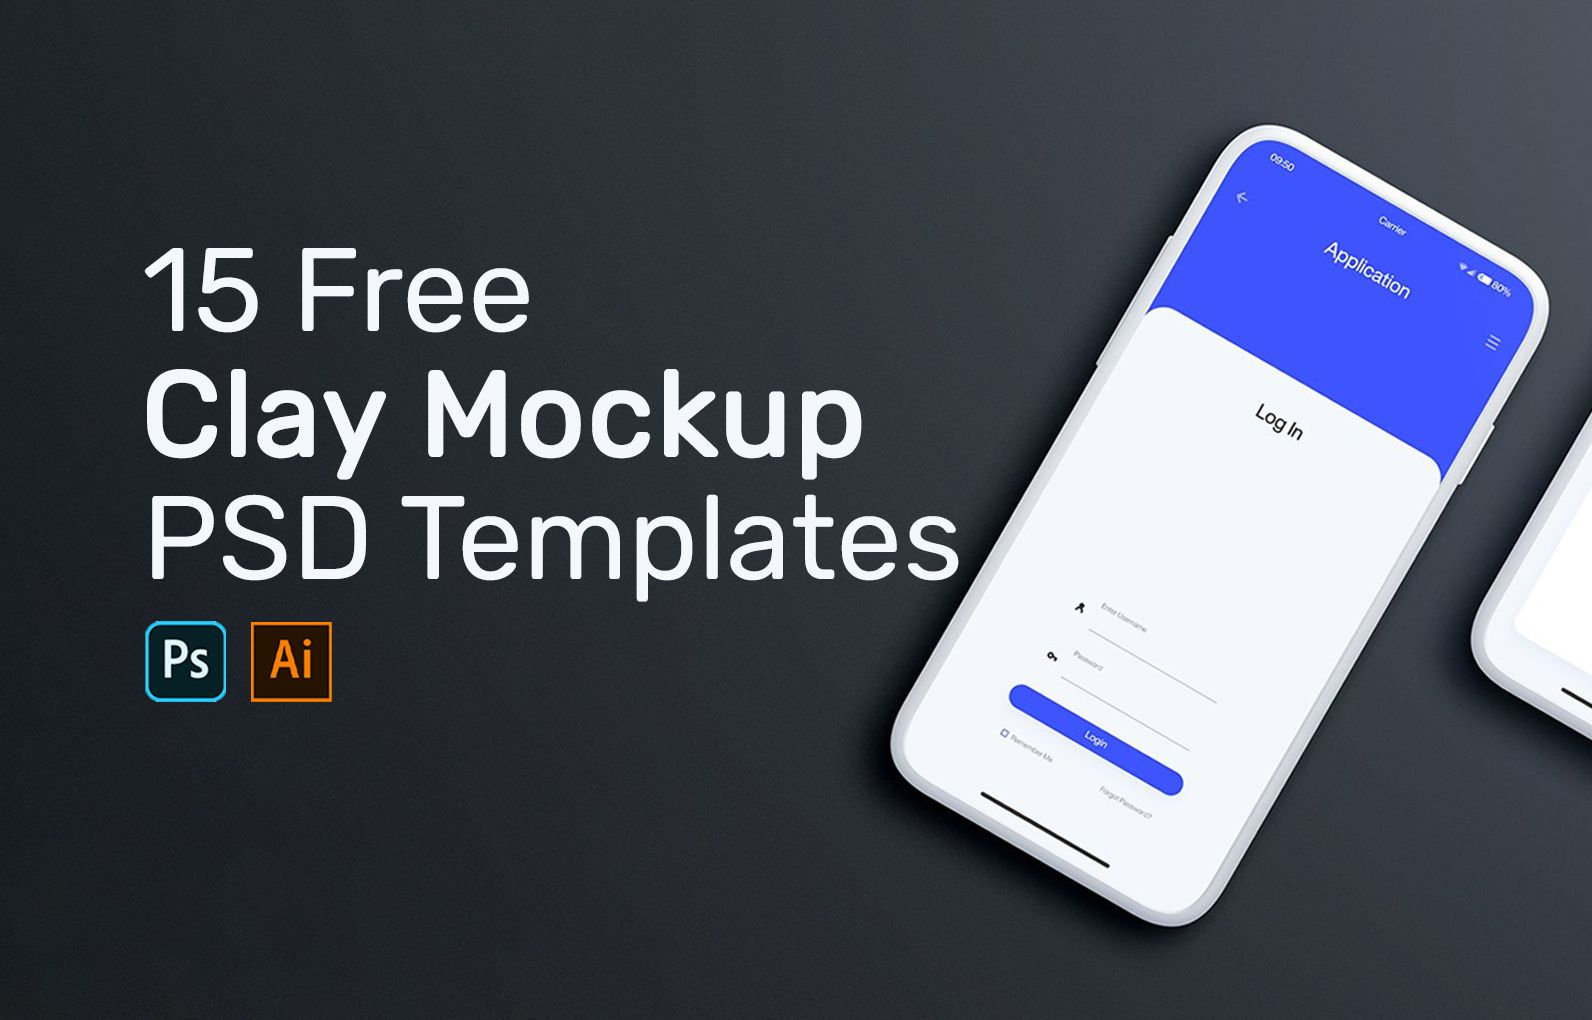 15 Free Clay Mockup Psd Templates Ai Included Psd Templates Mockup Psd Macbook Mockup Free